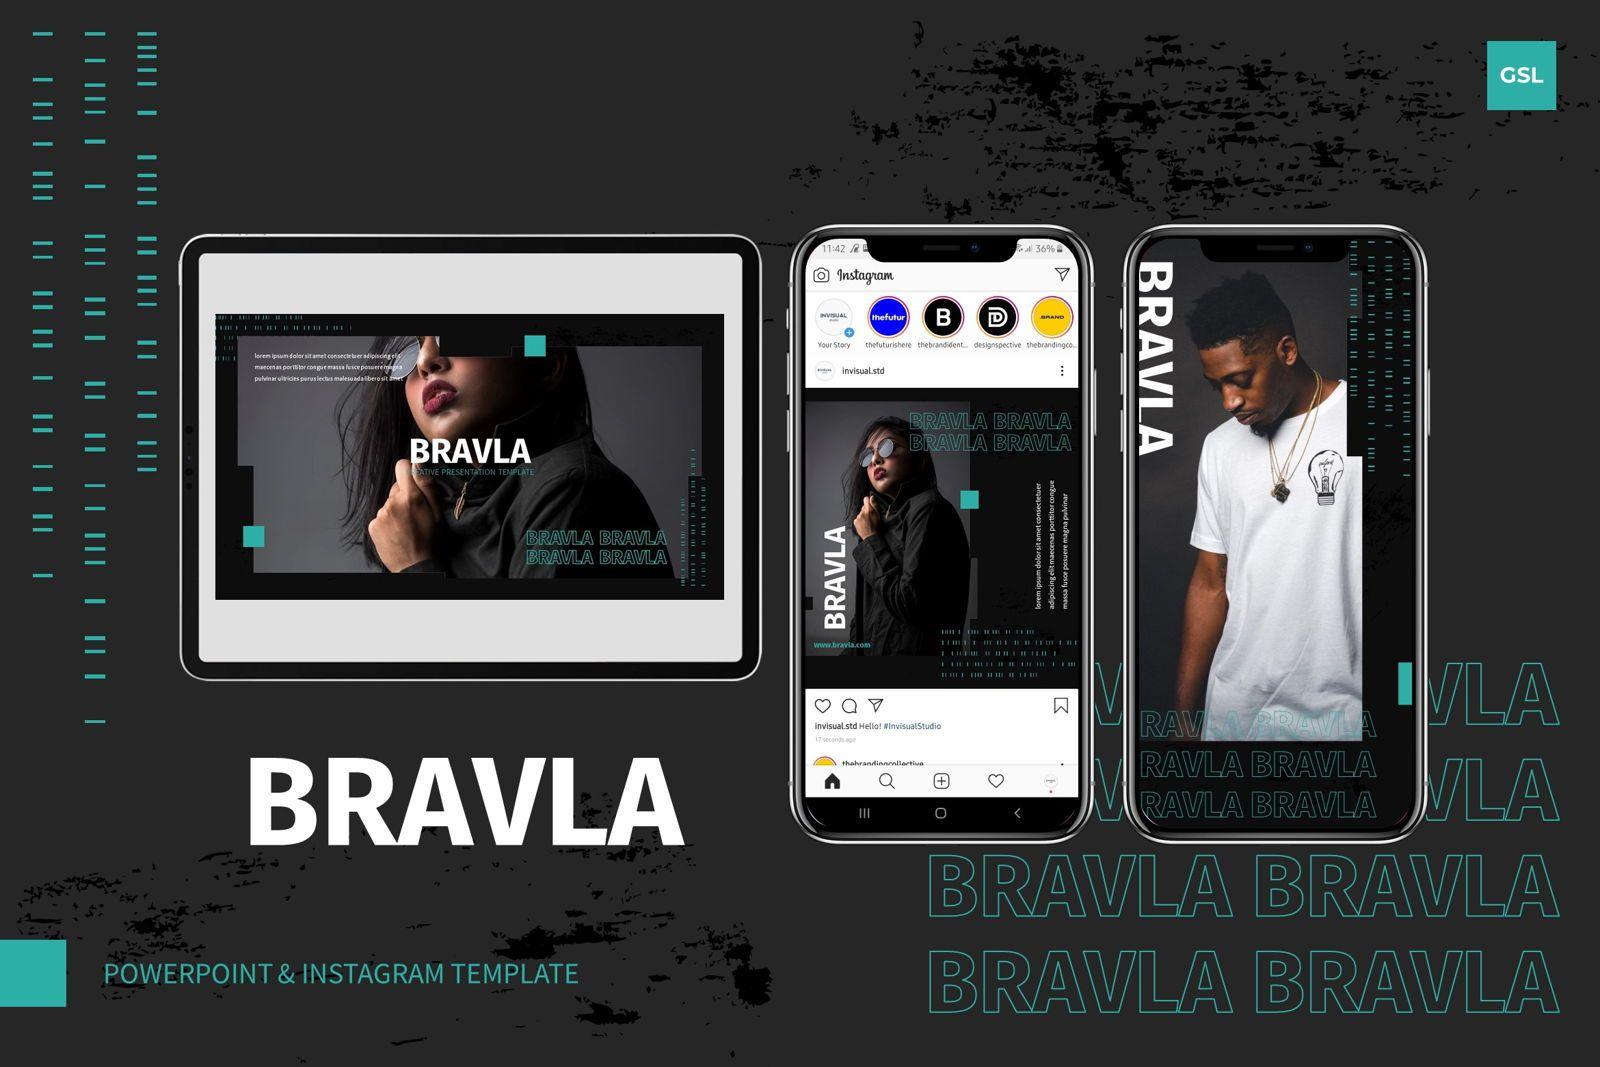 Bravla - Google Slides Template, 07790, Presentation Templates — PoweredTemplate.com